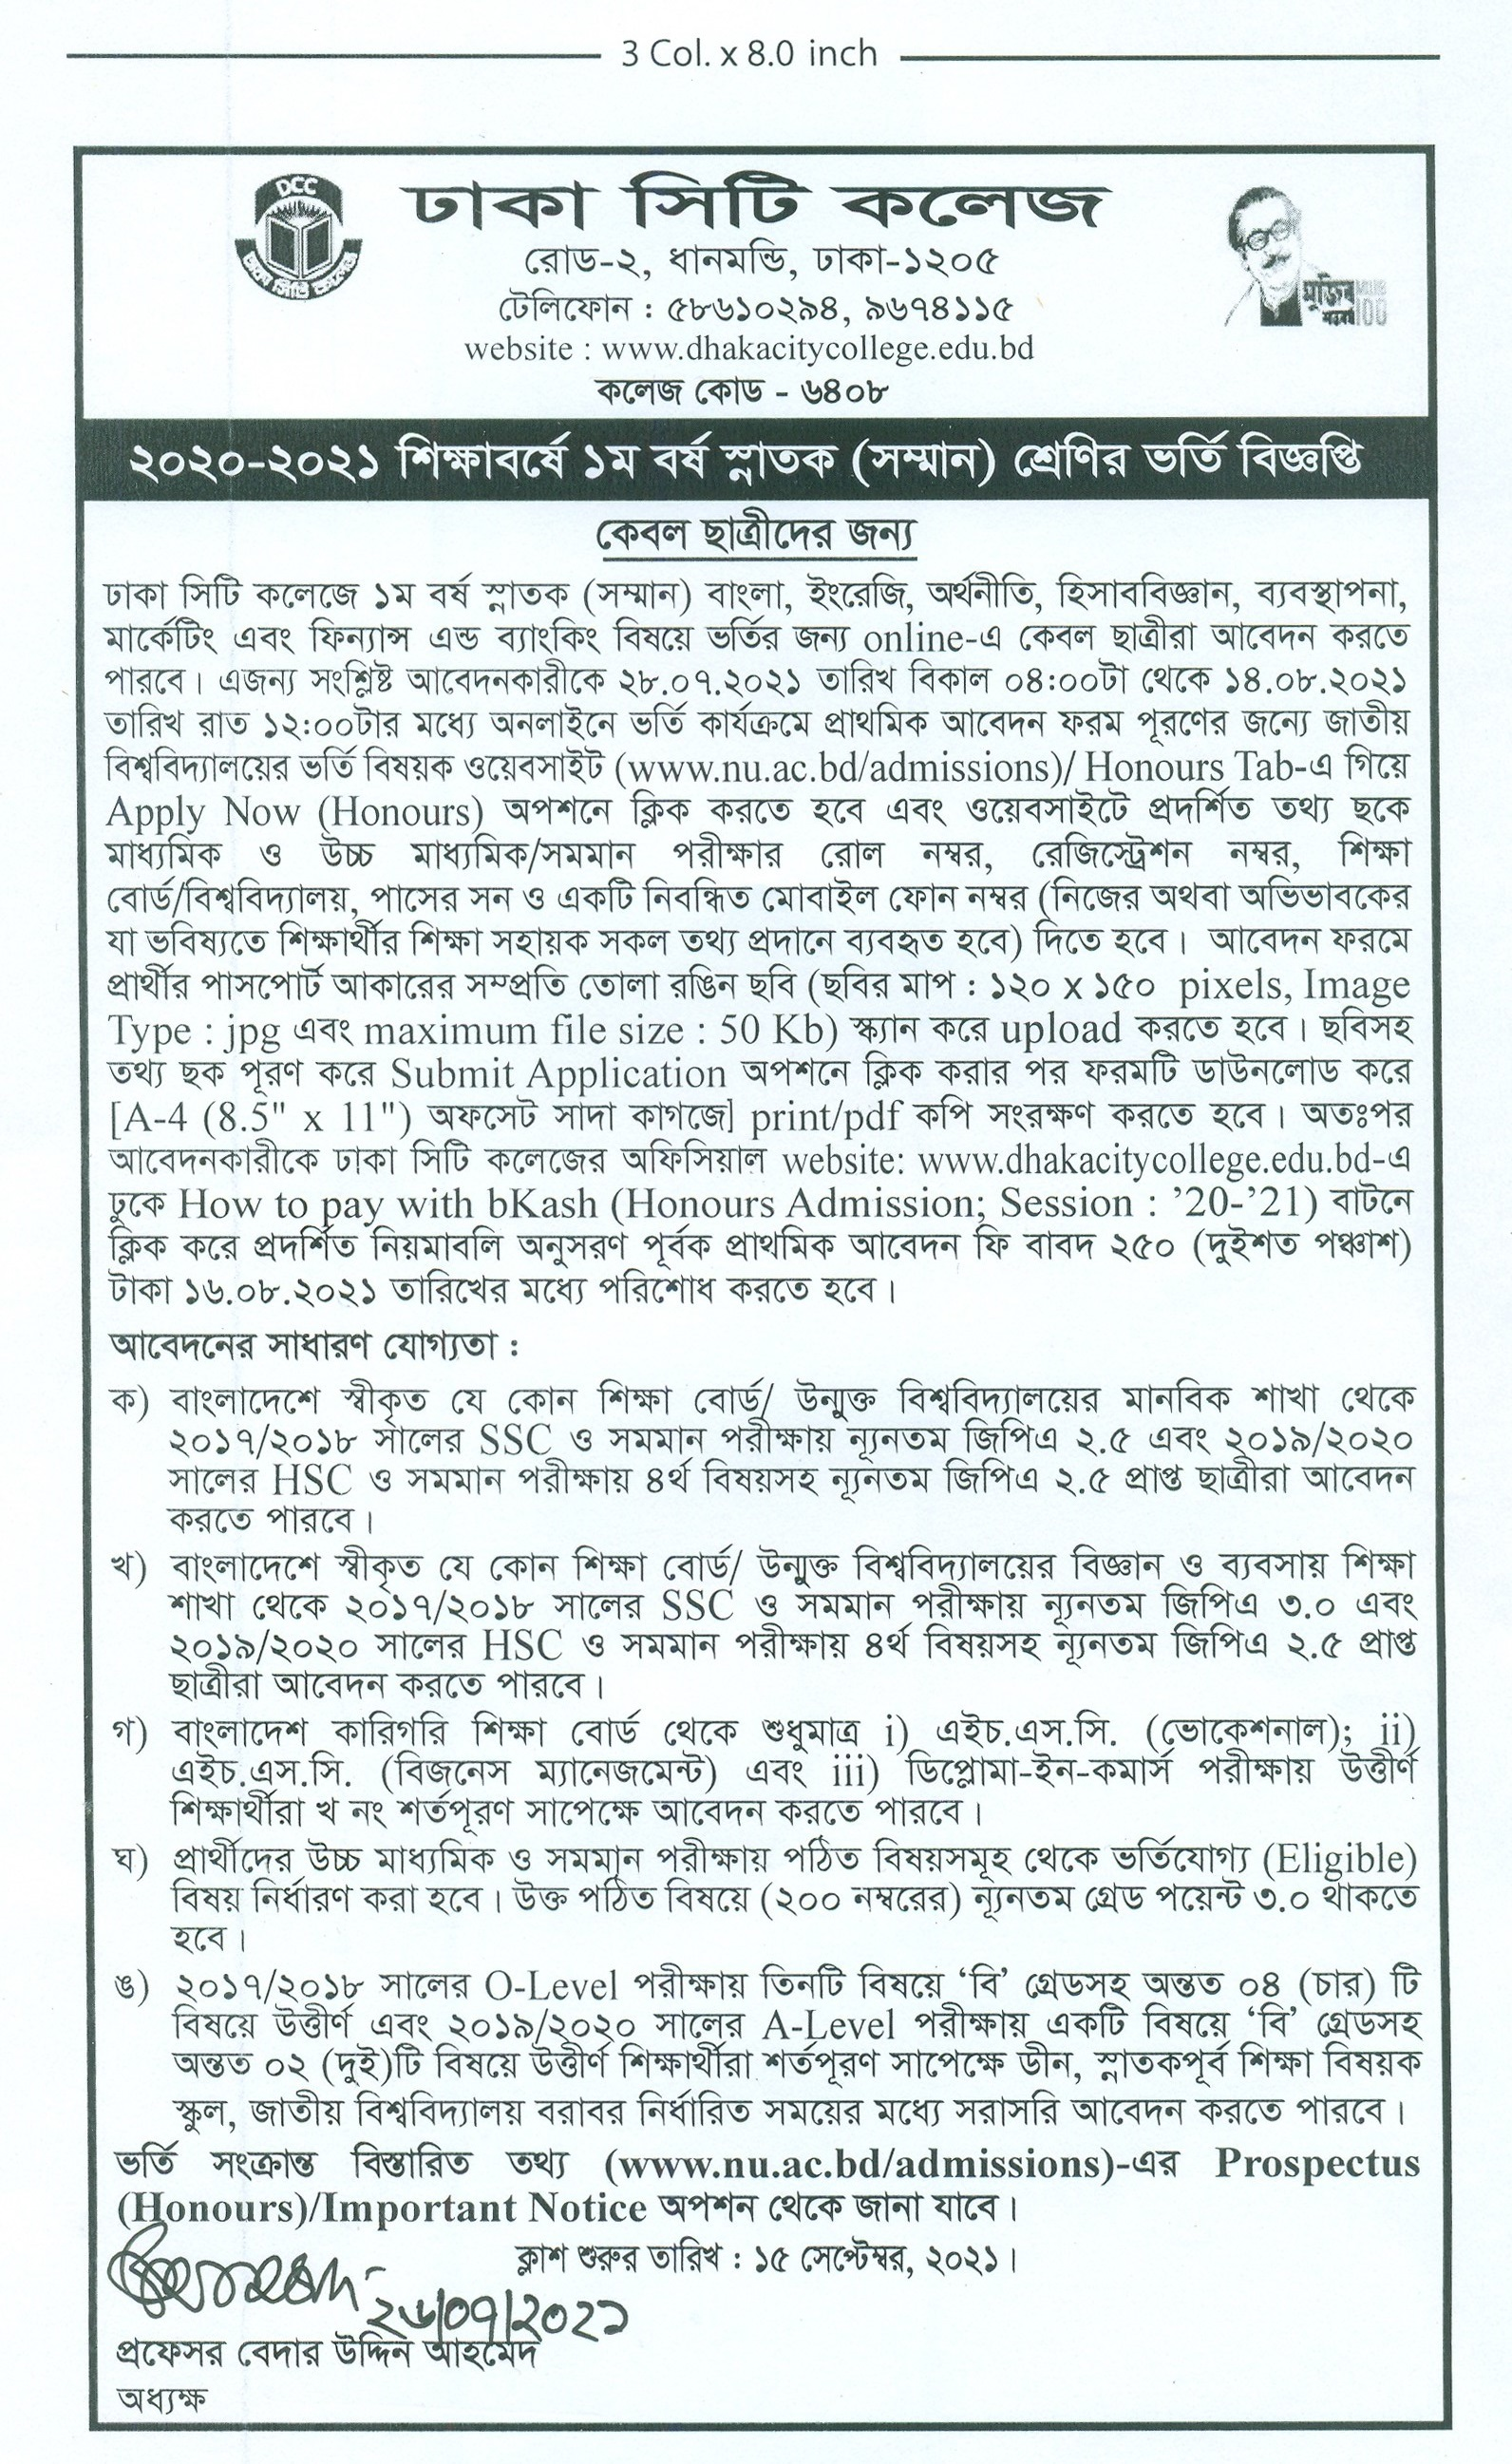 dhaka-city-college-honours-admission-circular-2021